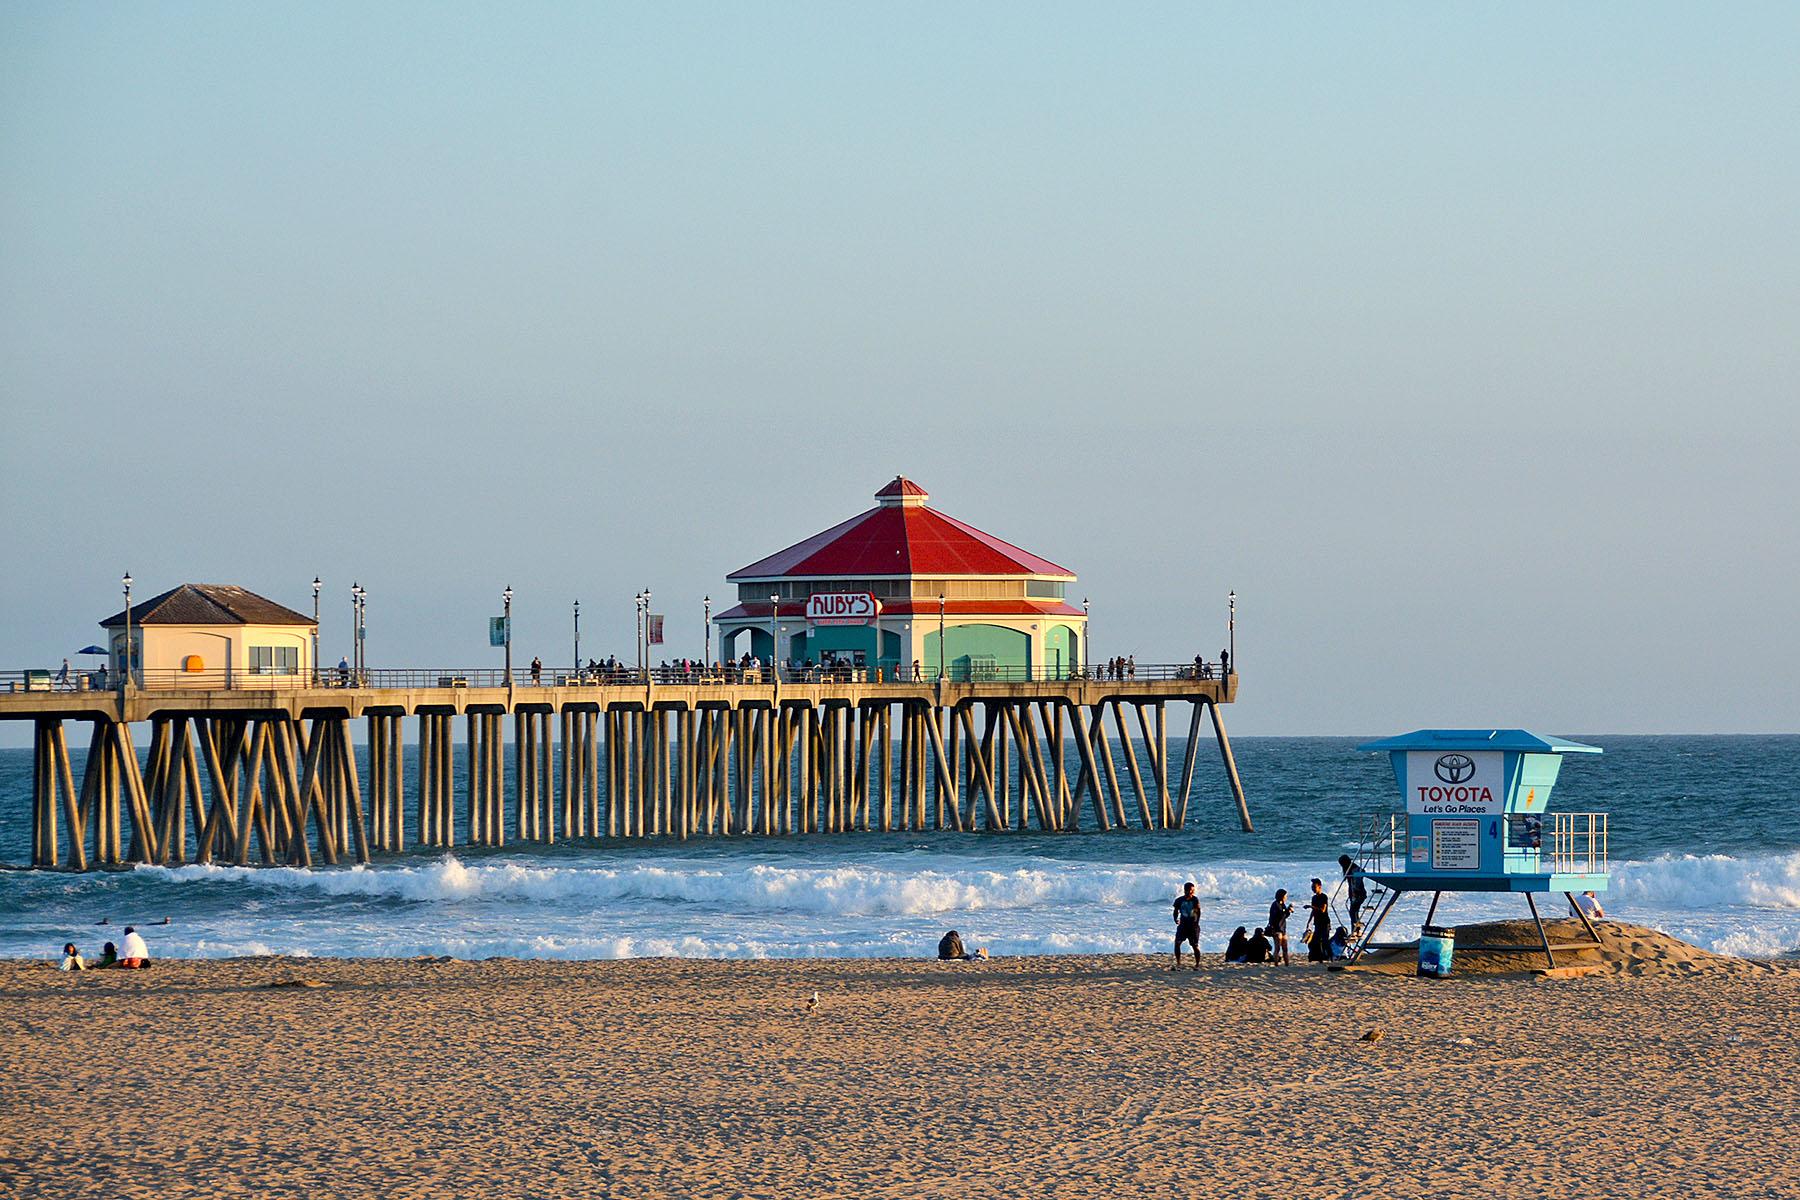 Rubys Huntington Beach Kalifornien